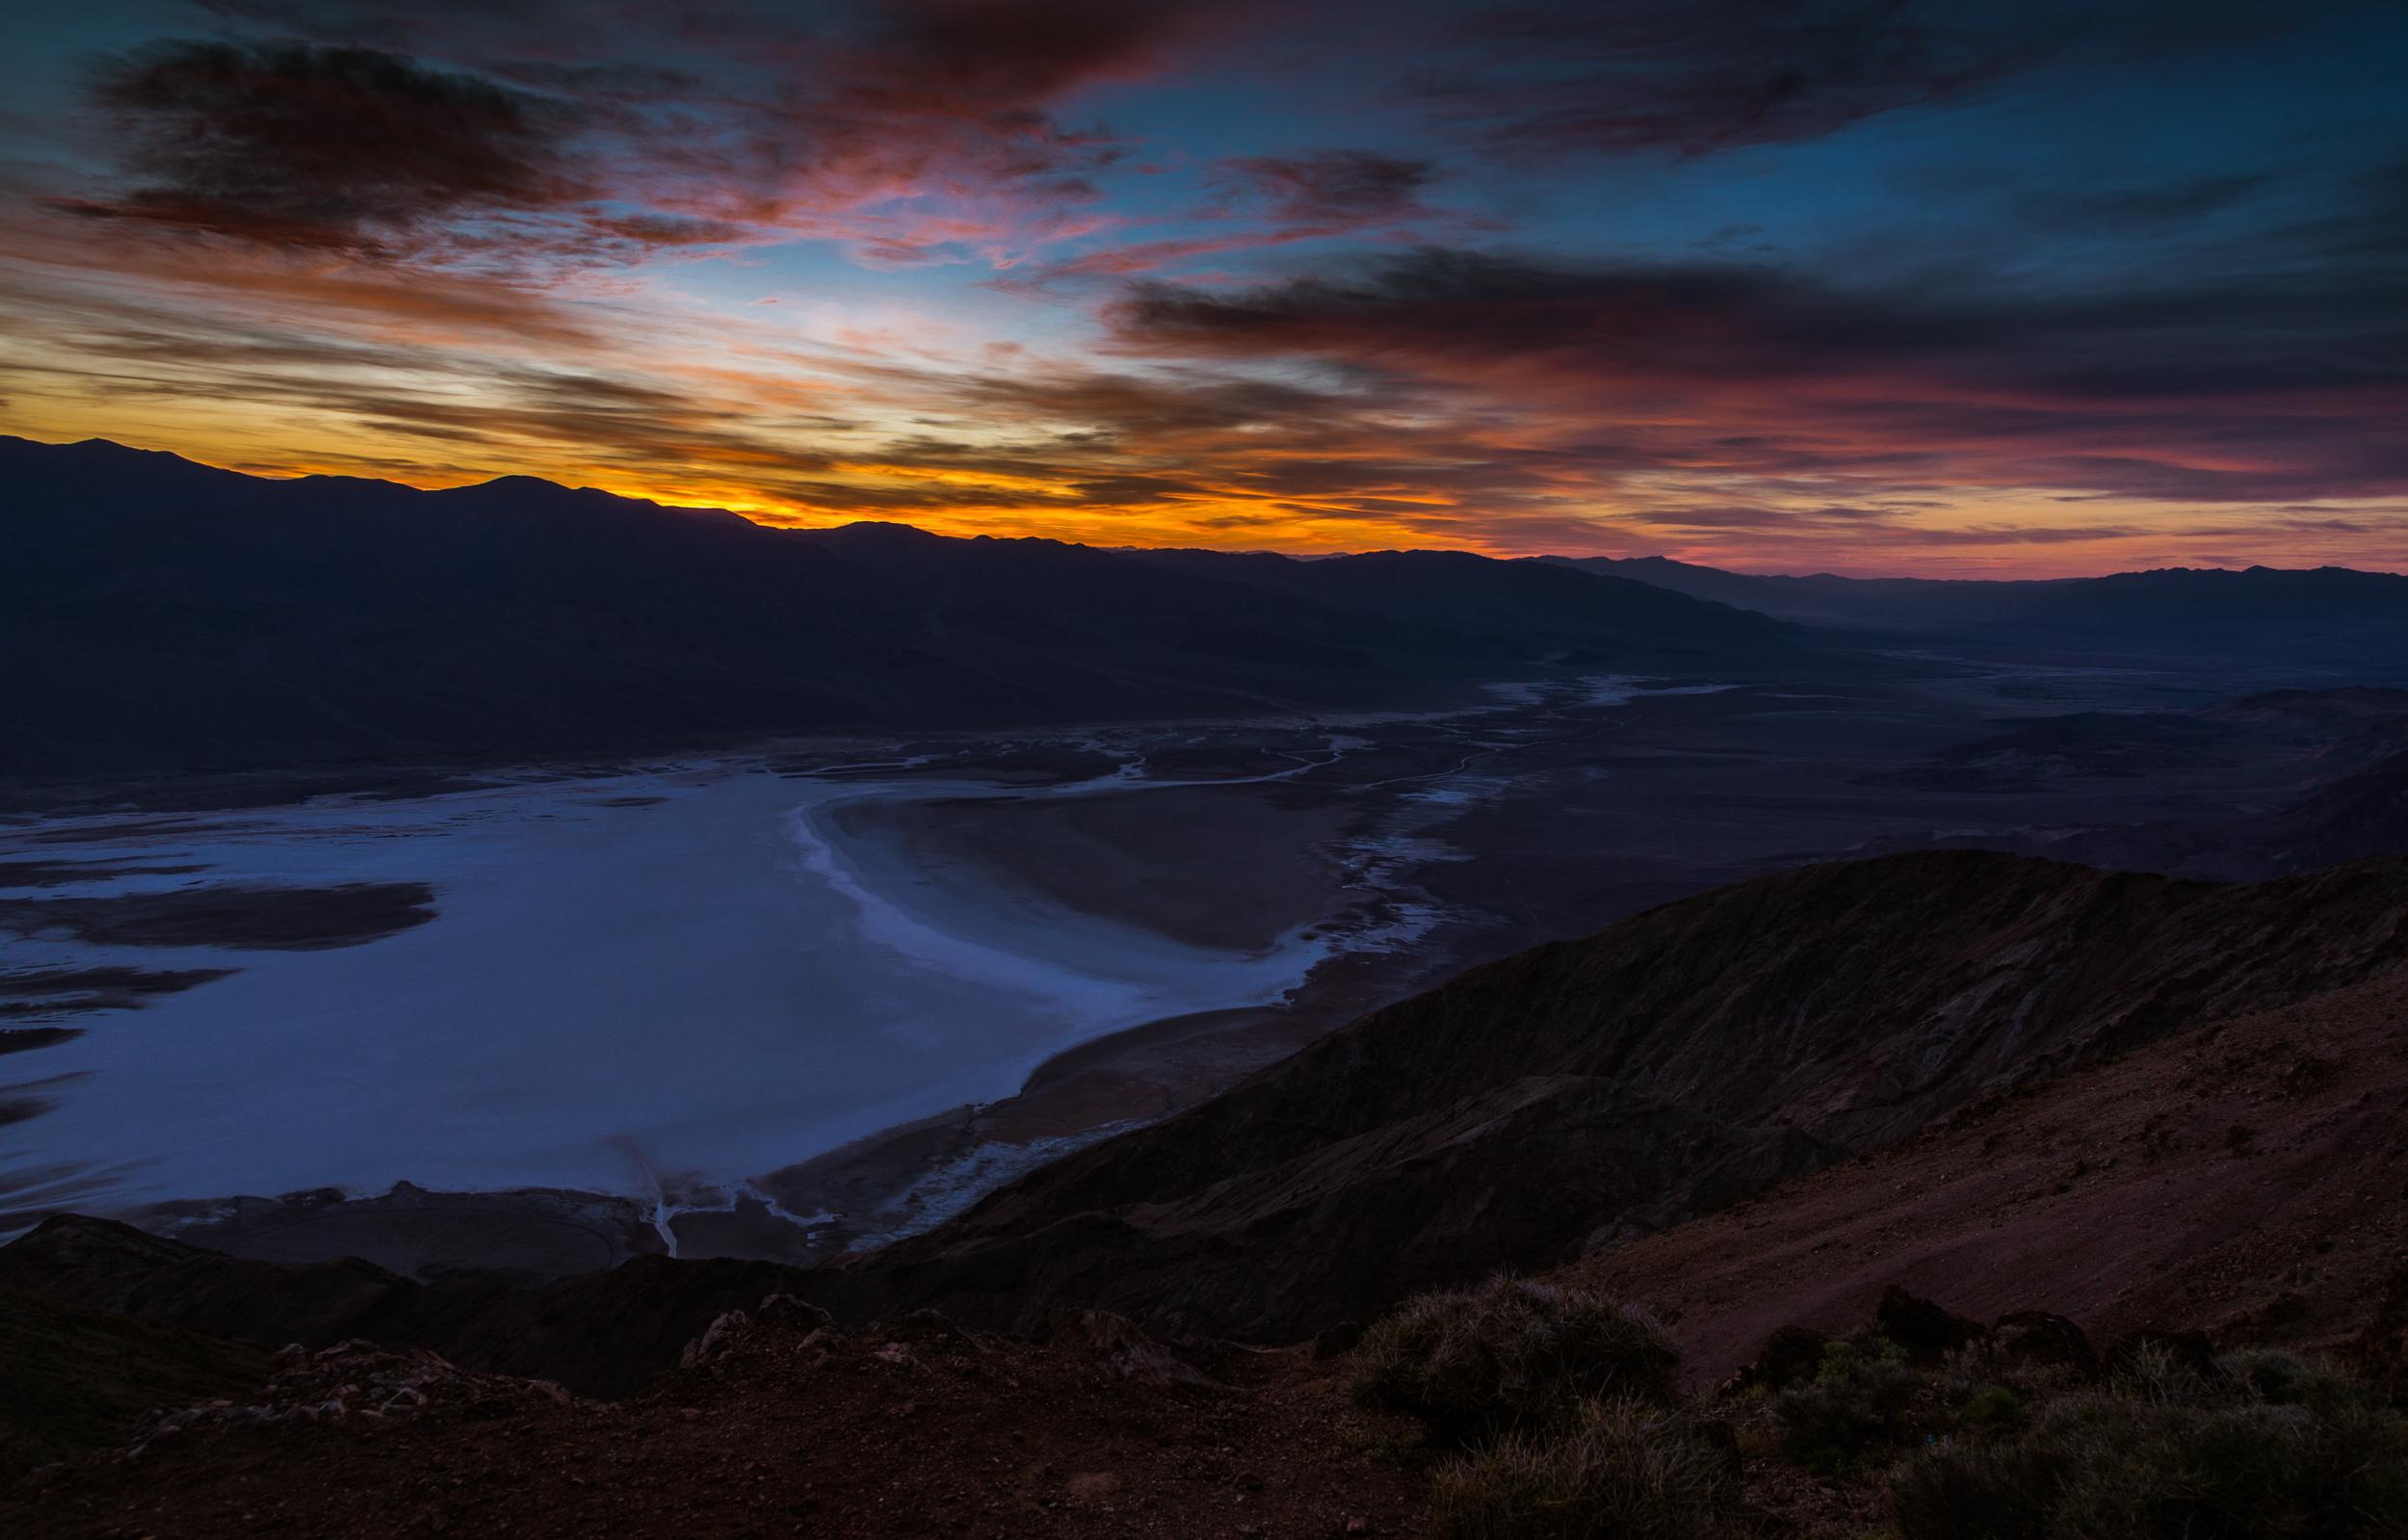 Sunset, Dante's View